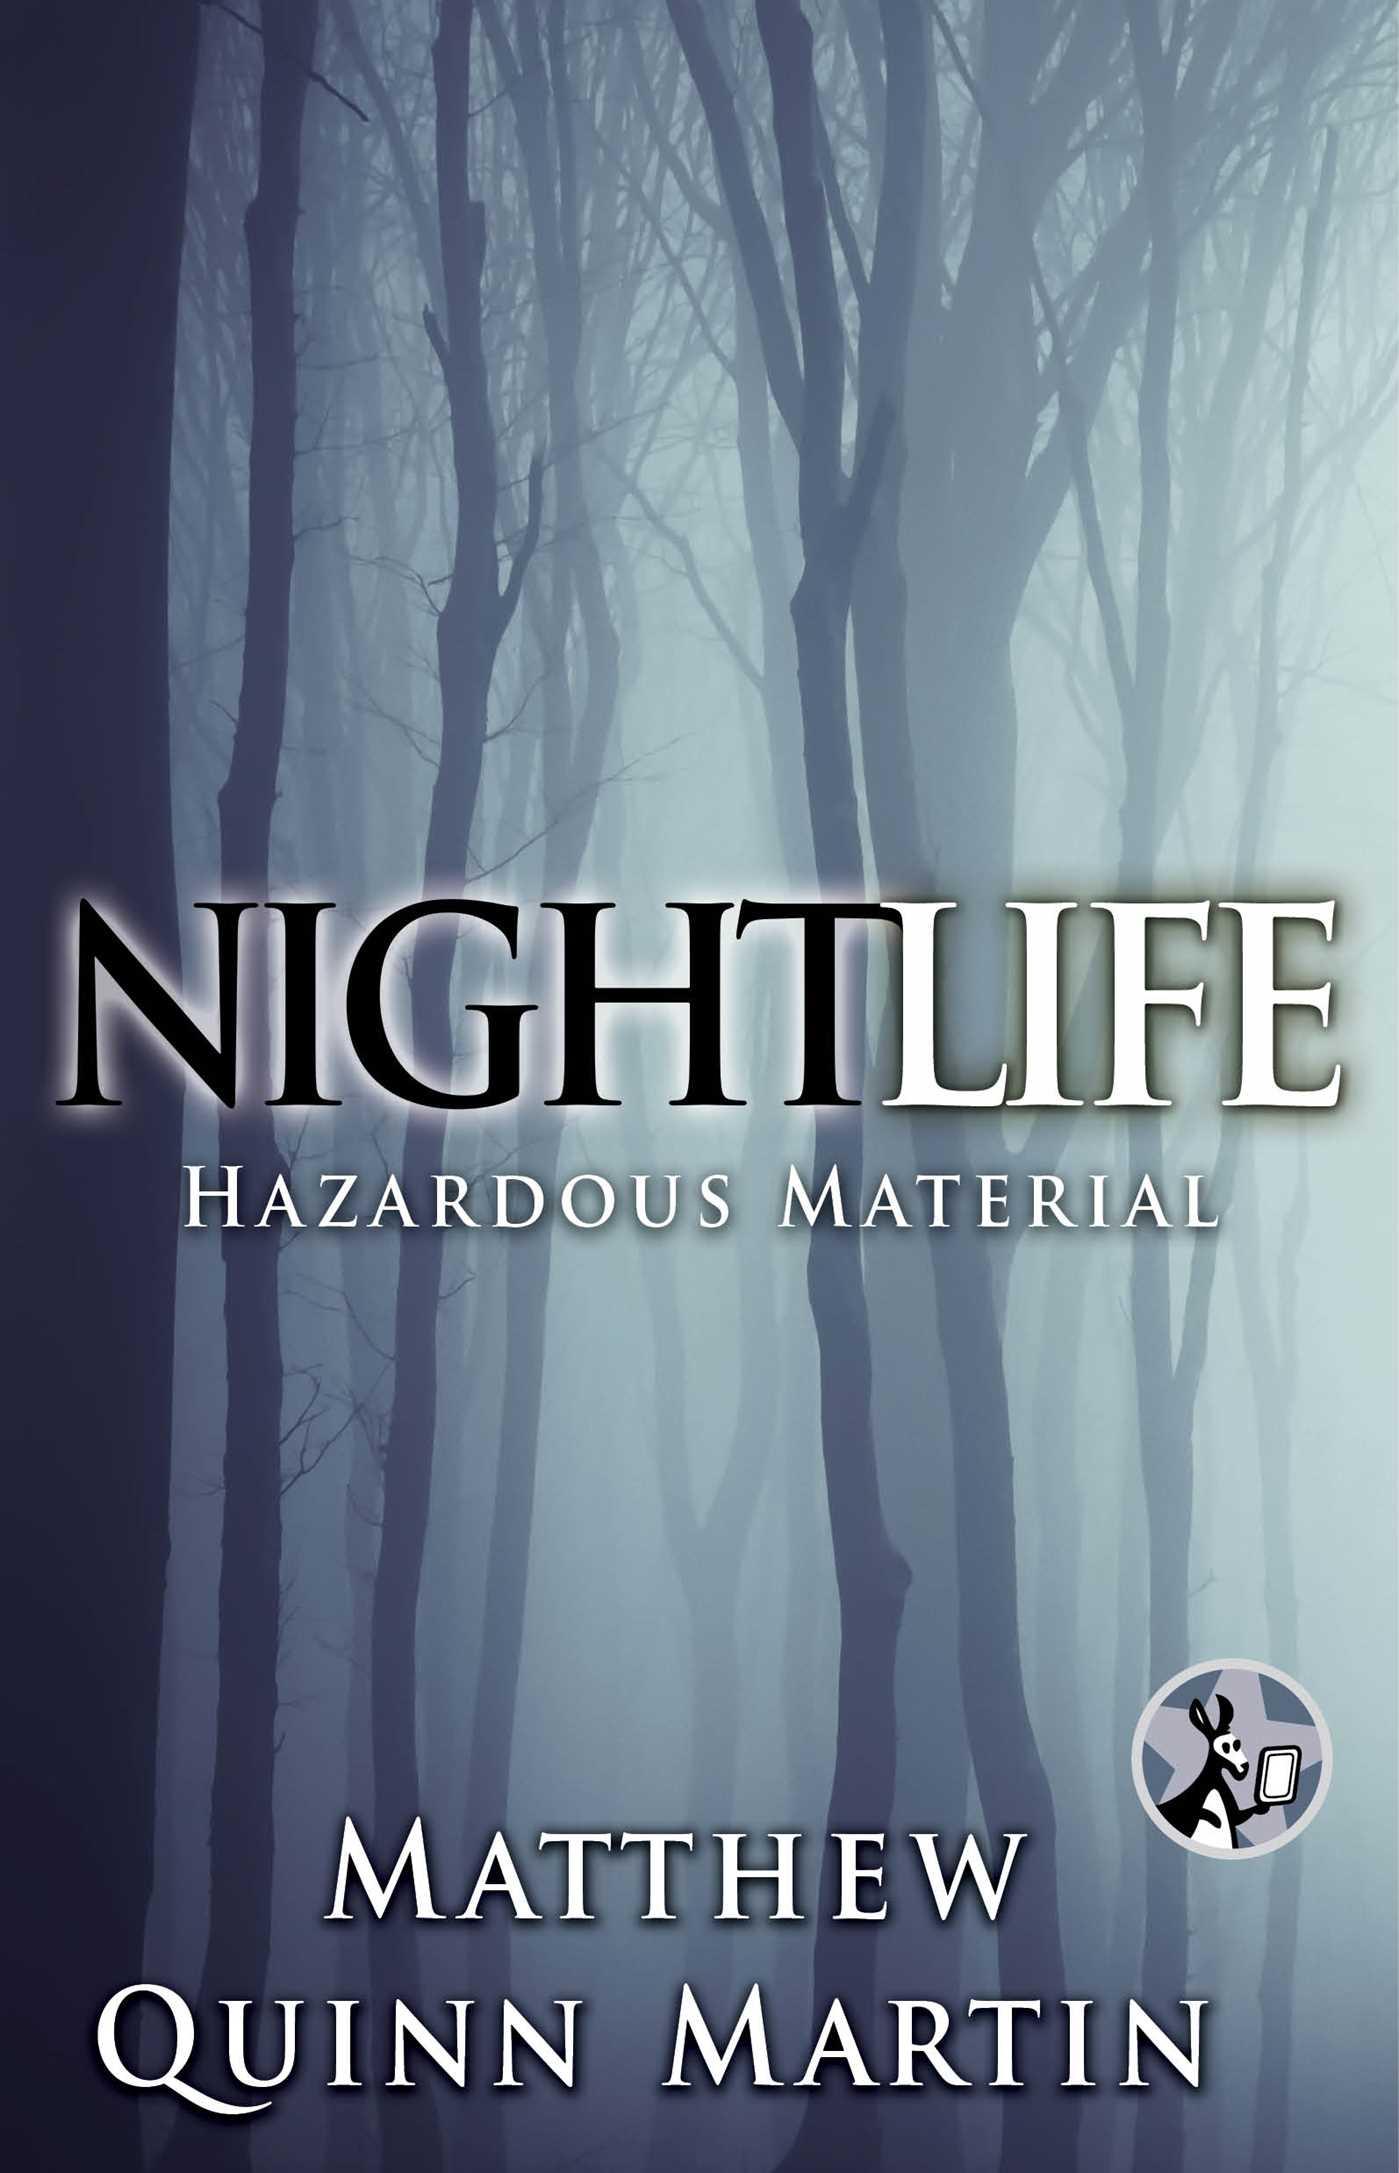 Nightlife hazardous material 9781501108860 hr